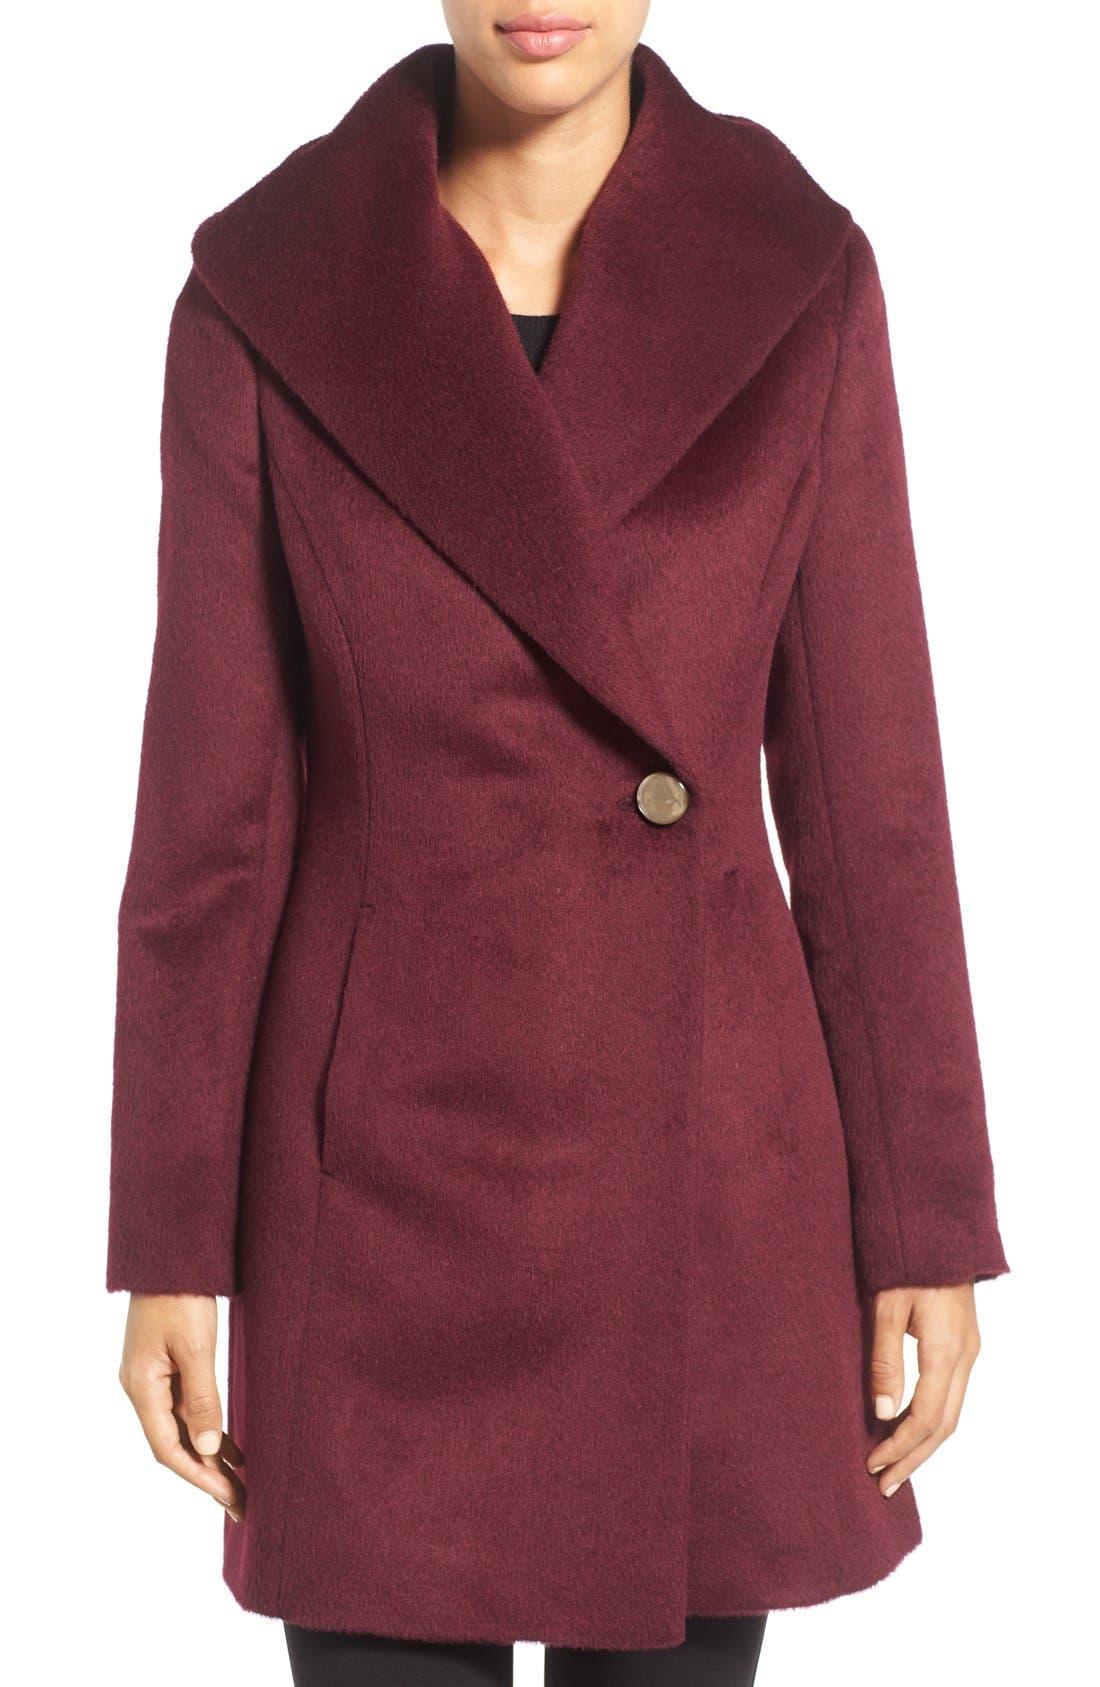 Main Image - Trina Turk 'Bonnie' Shawl Collar Skirted Coat (Regular & Petite)